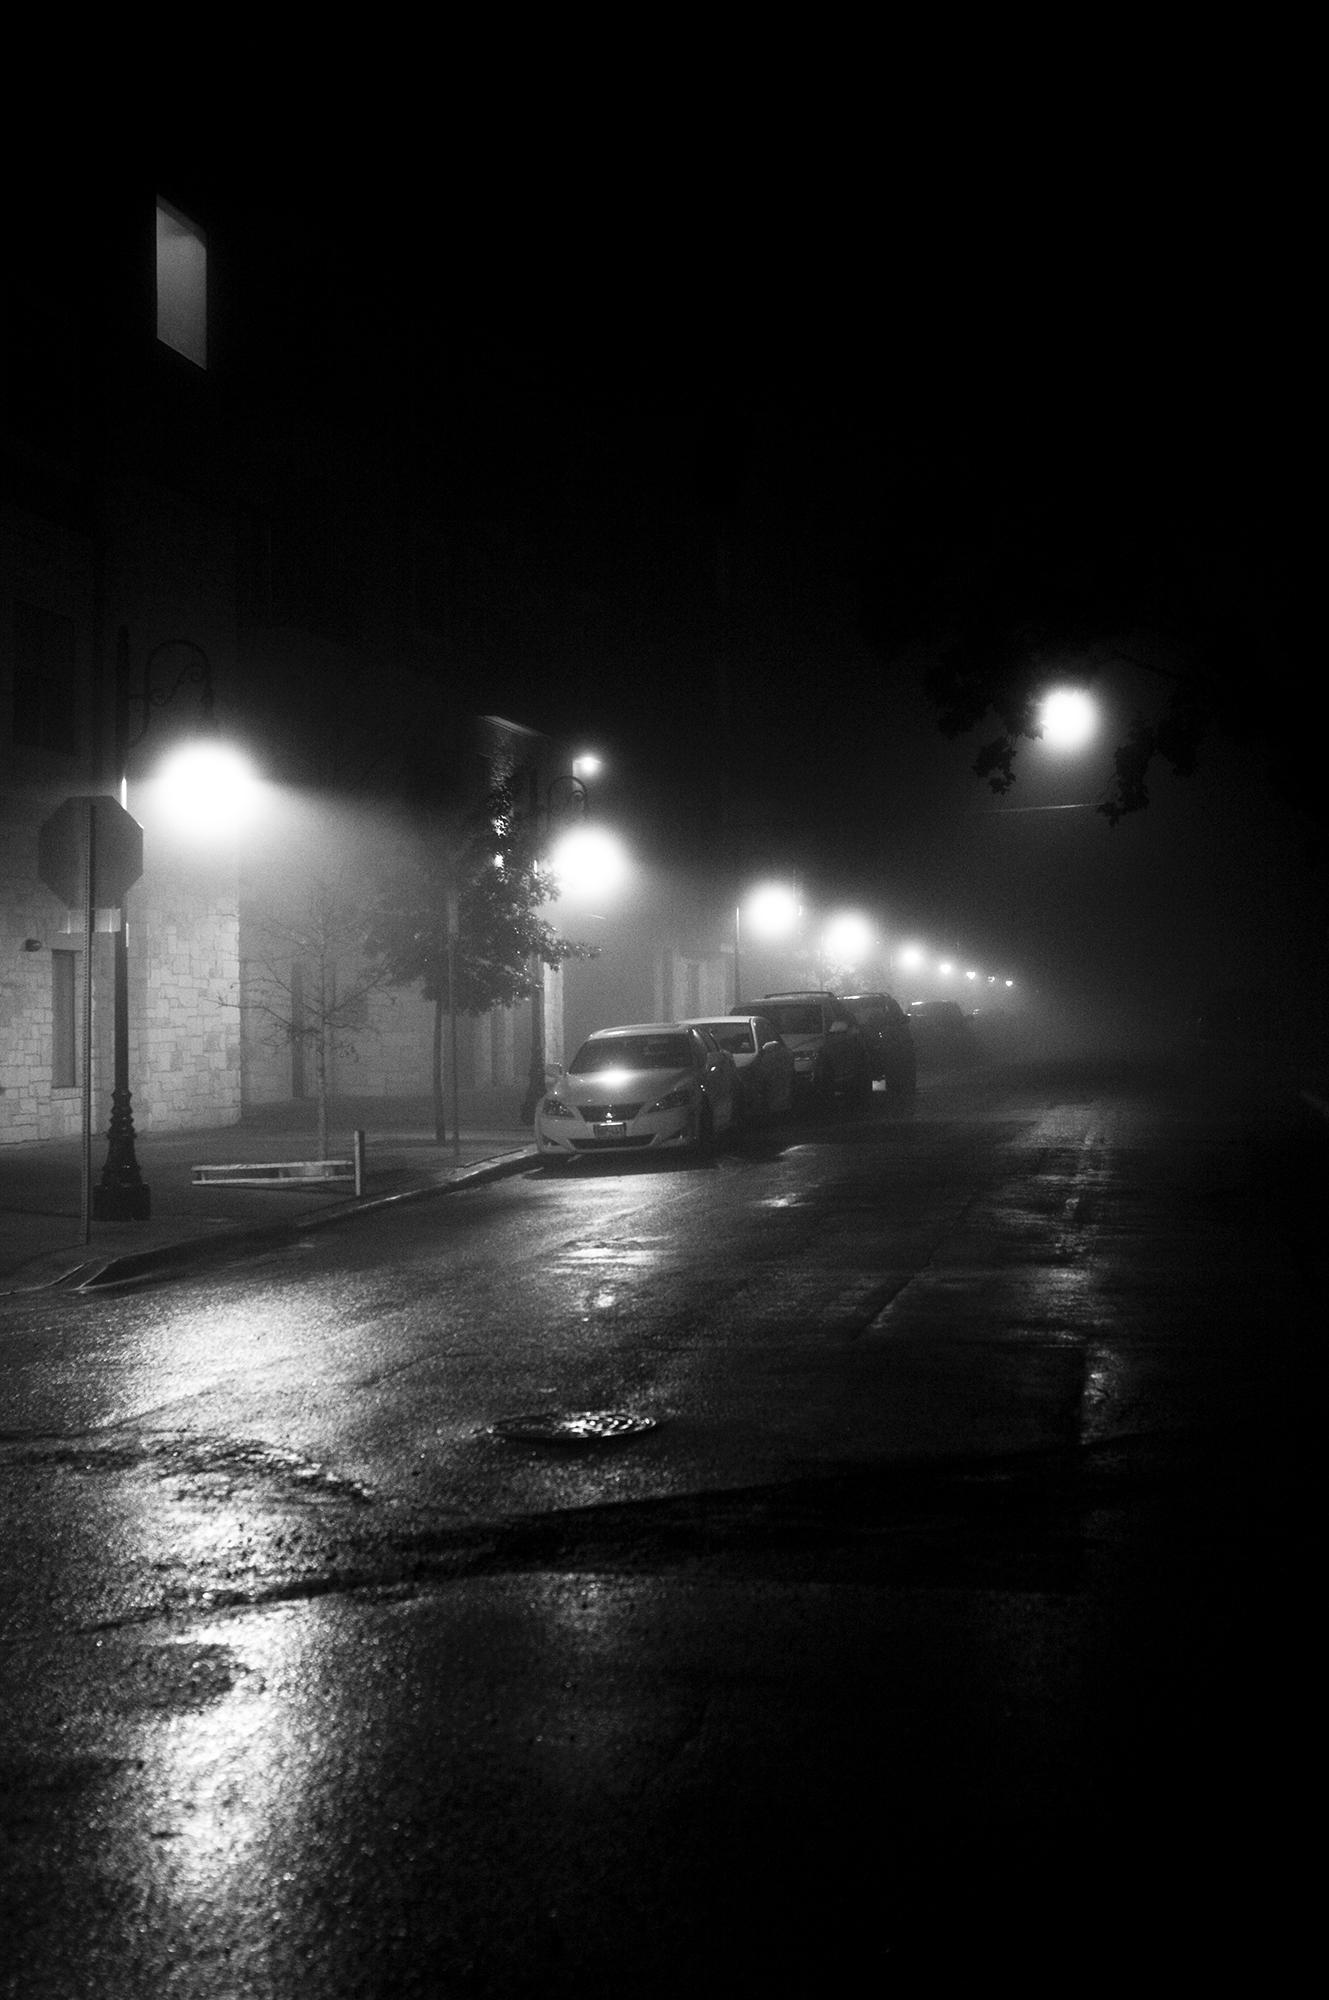 streets-fog_2-finish.jpg